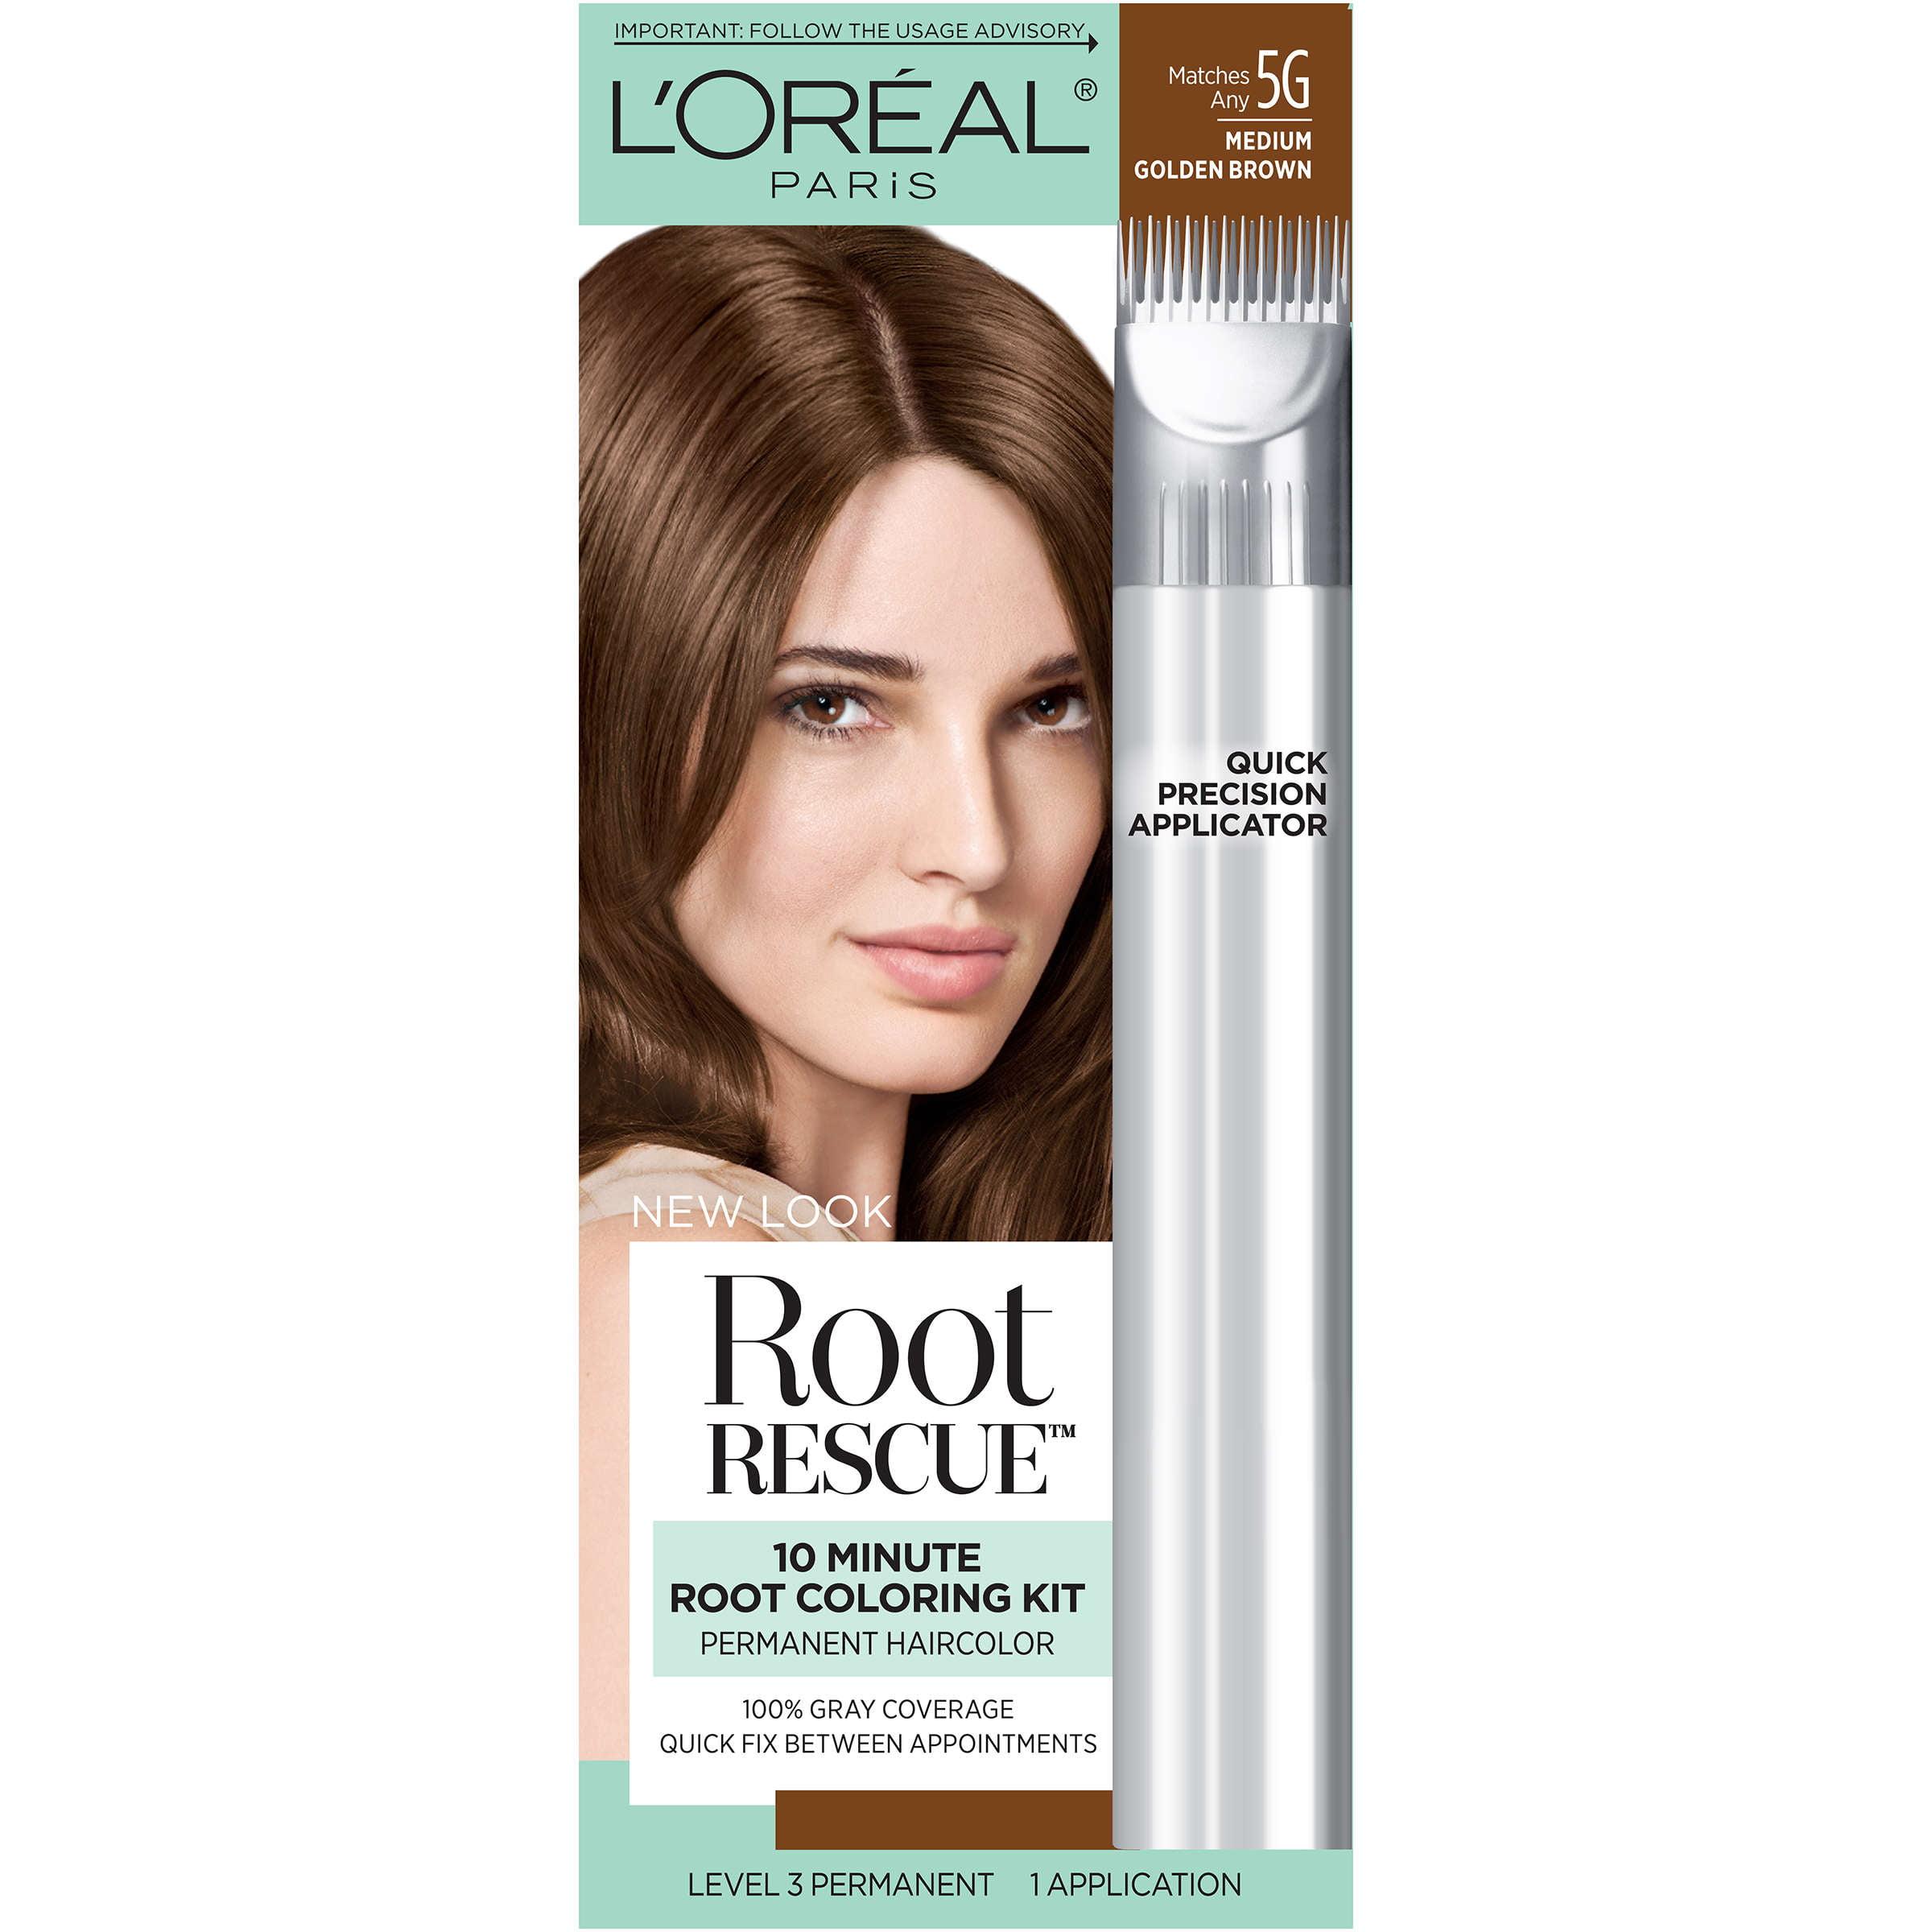 L\'Oreal Root Rescue Root Coloring Kit - Walmart.com